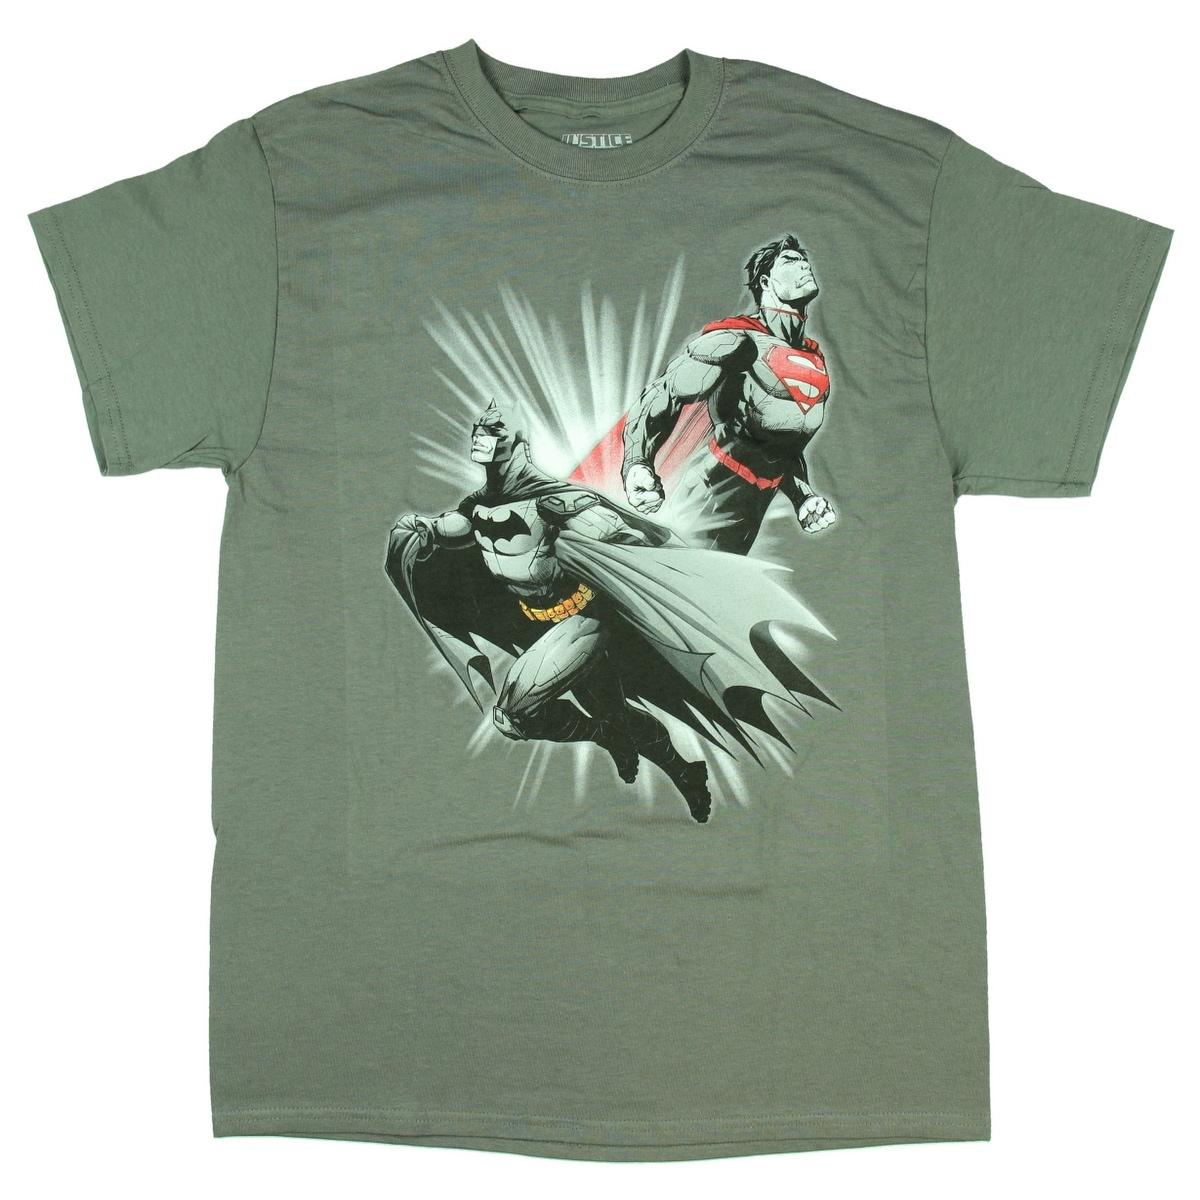 Big Group Adult Crewneck Sweatshirt Justice League of America